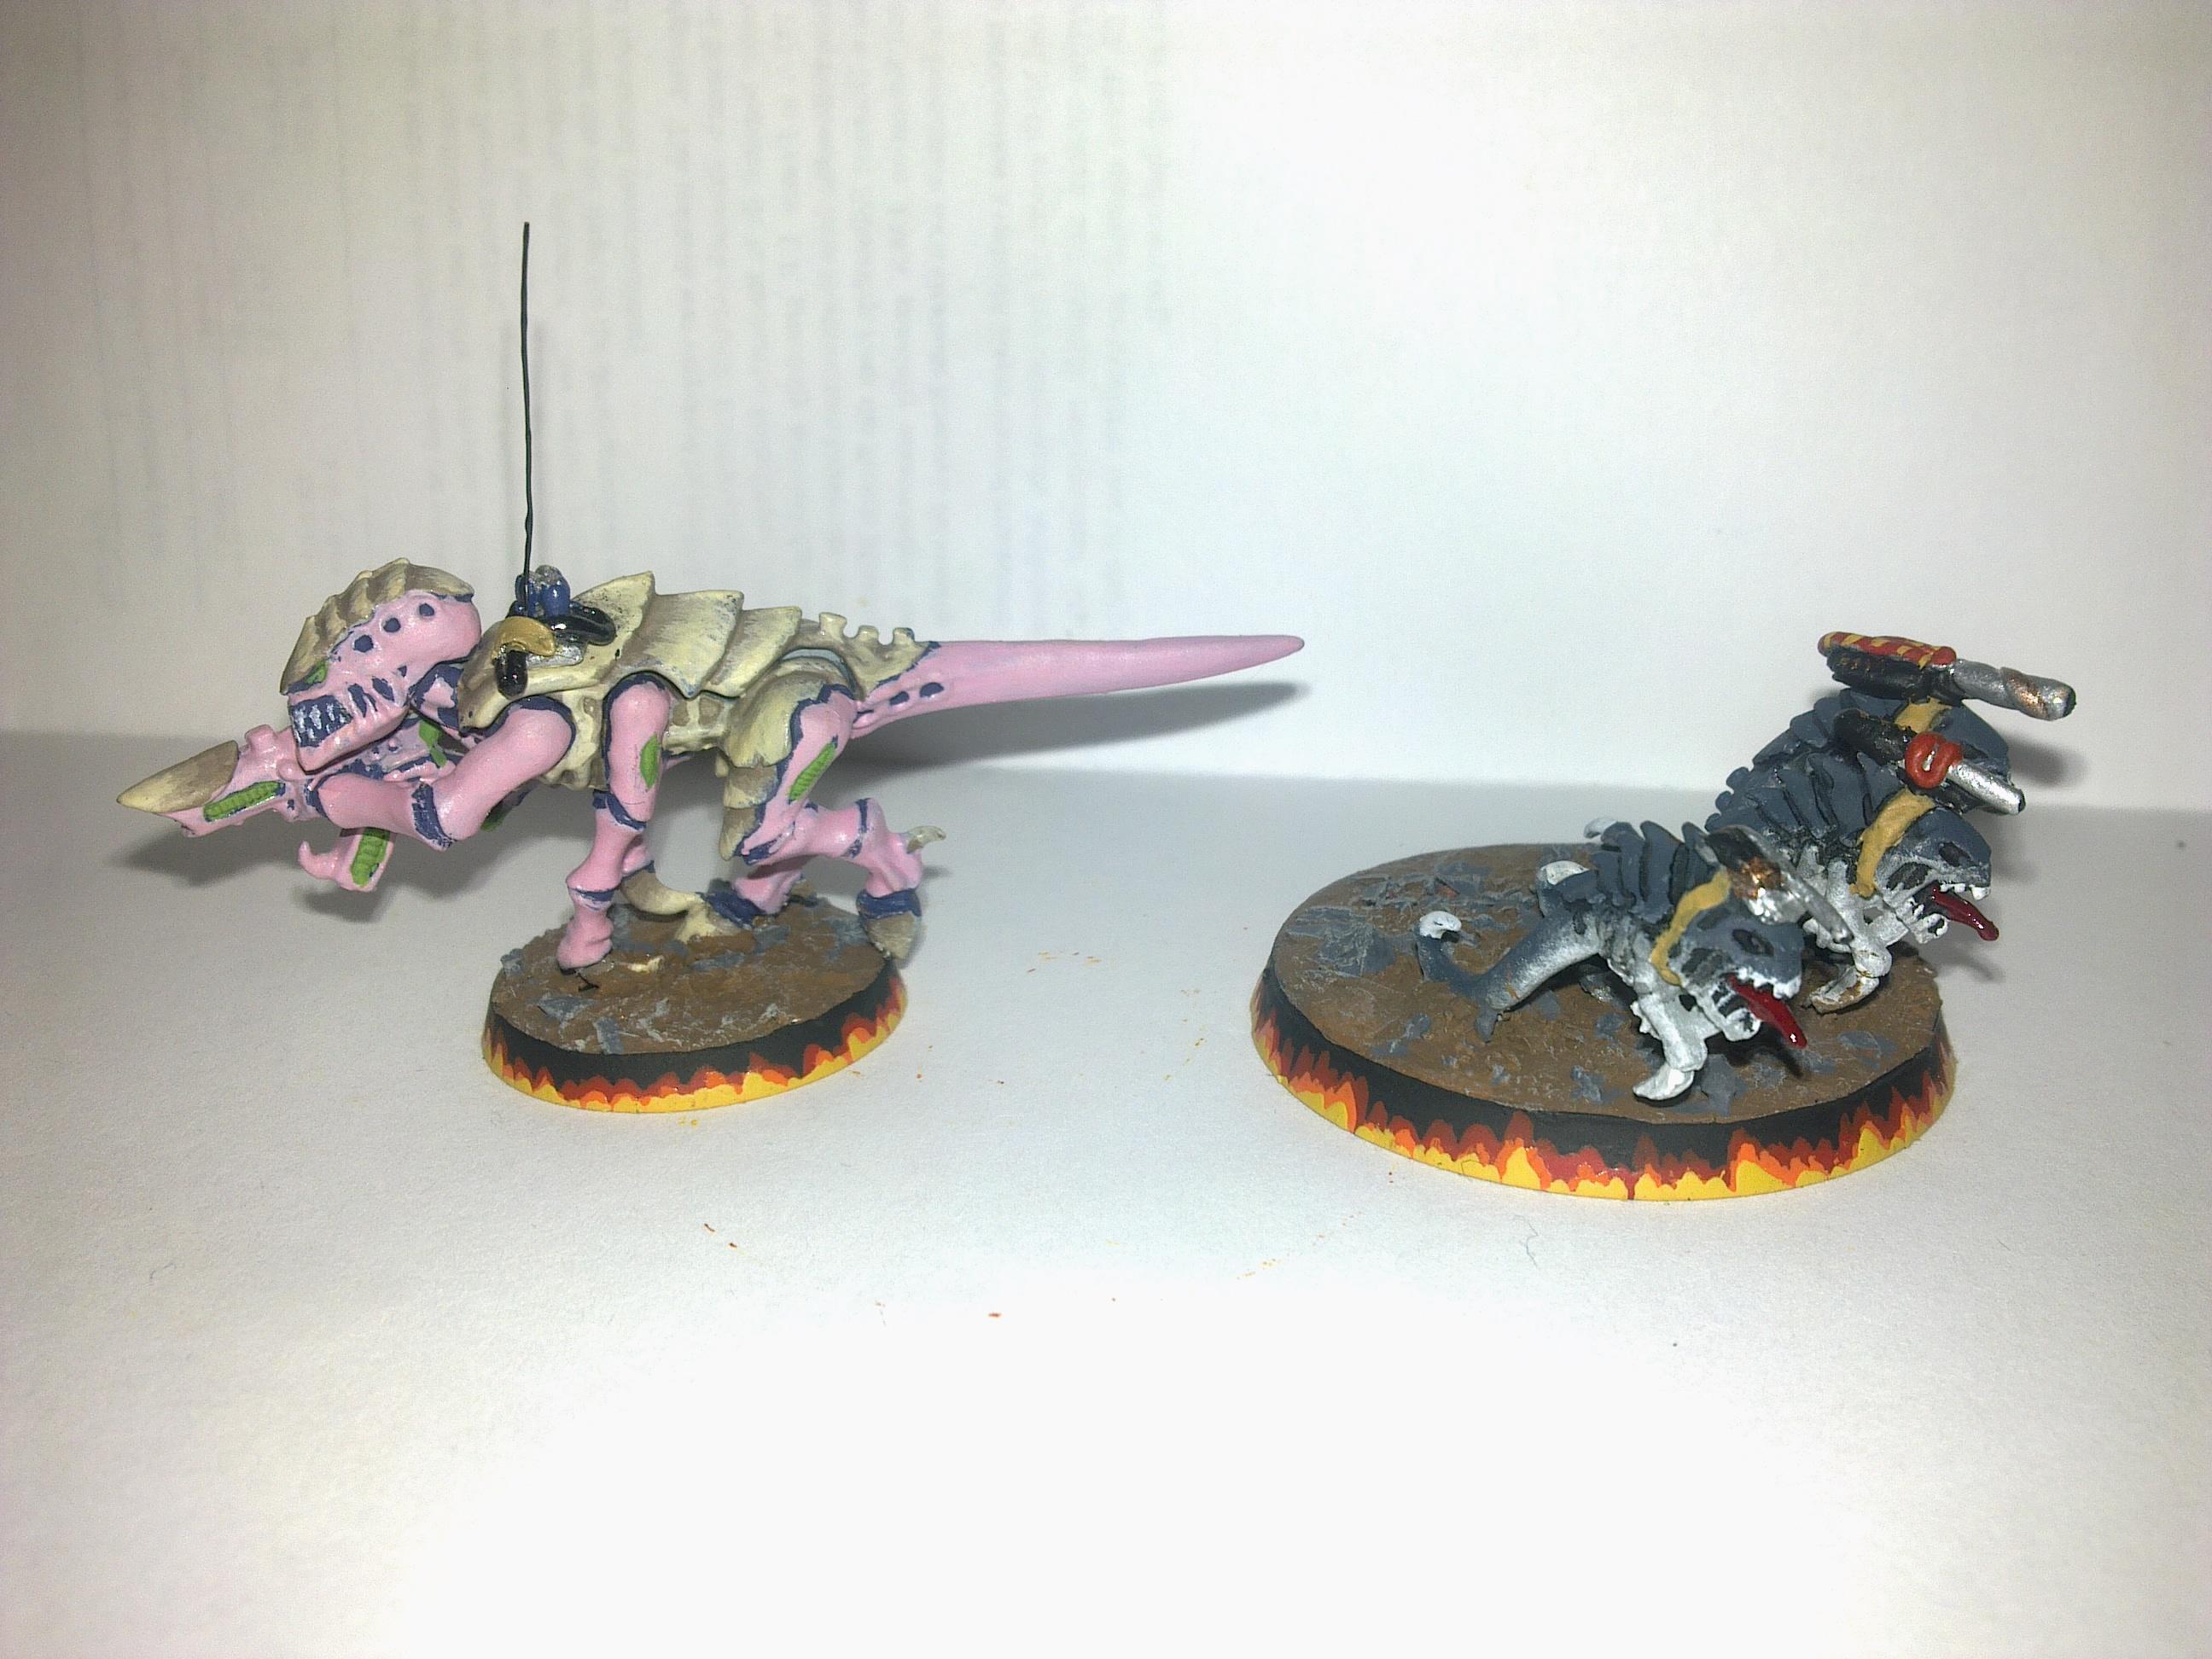 Lasers, Ripper Swarm, Termagants, Tyranids, Warhammer 40,000